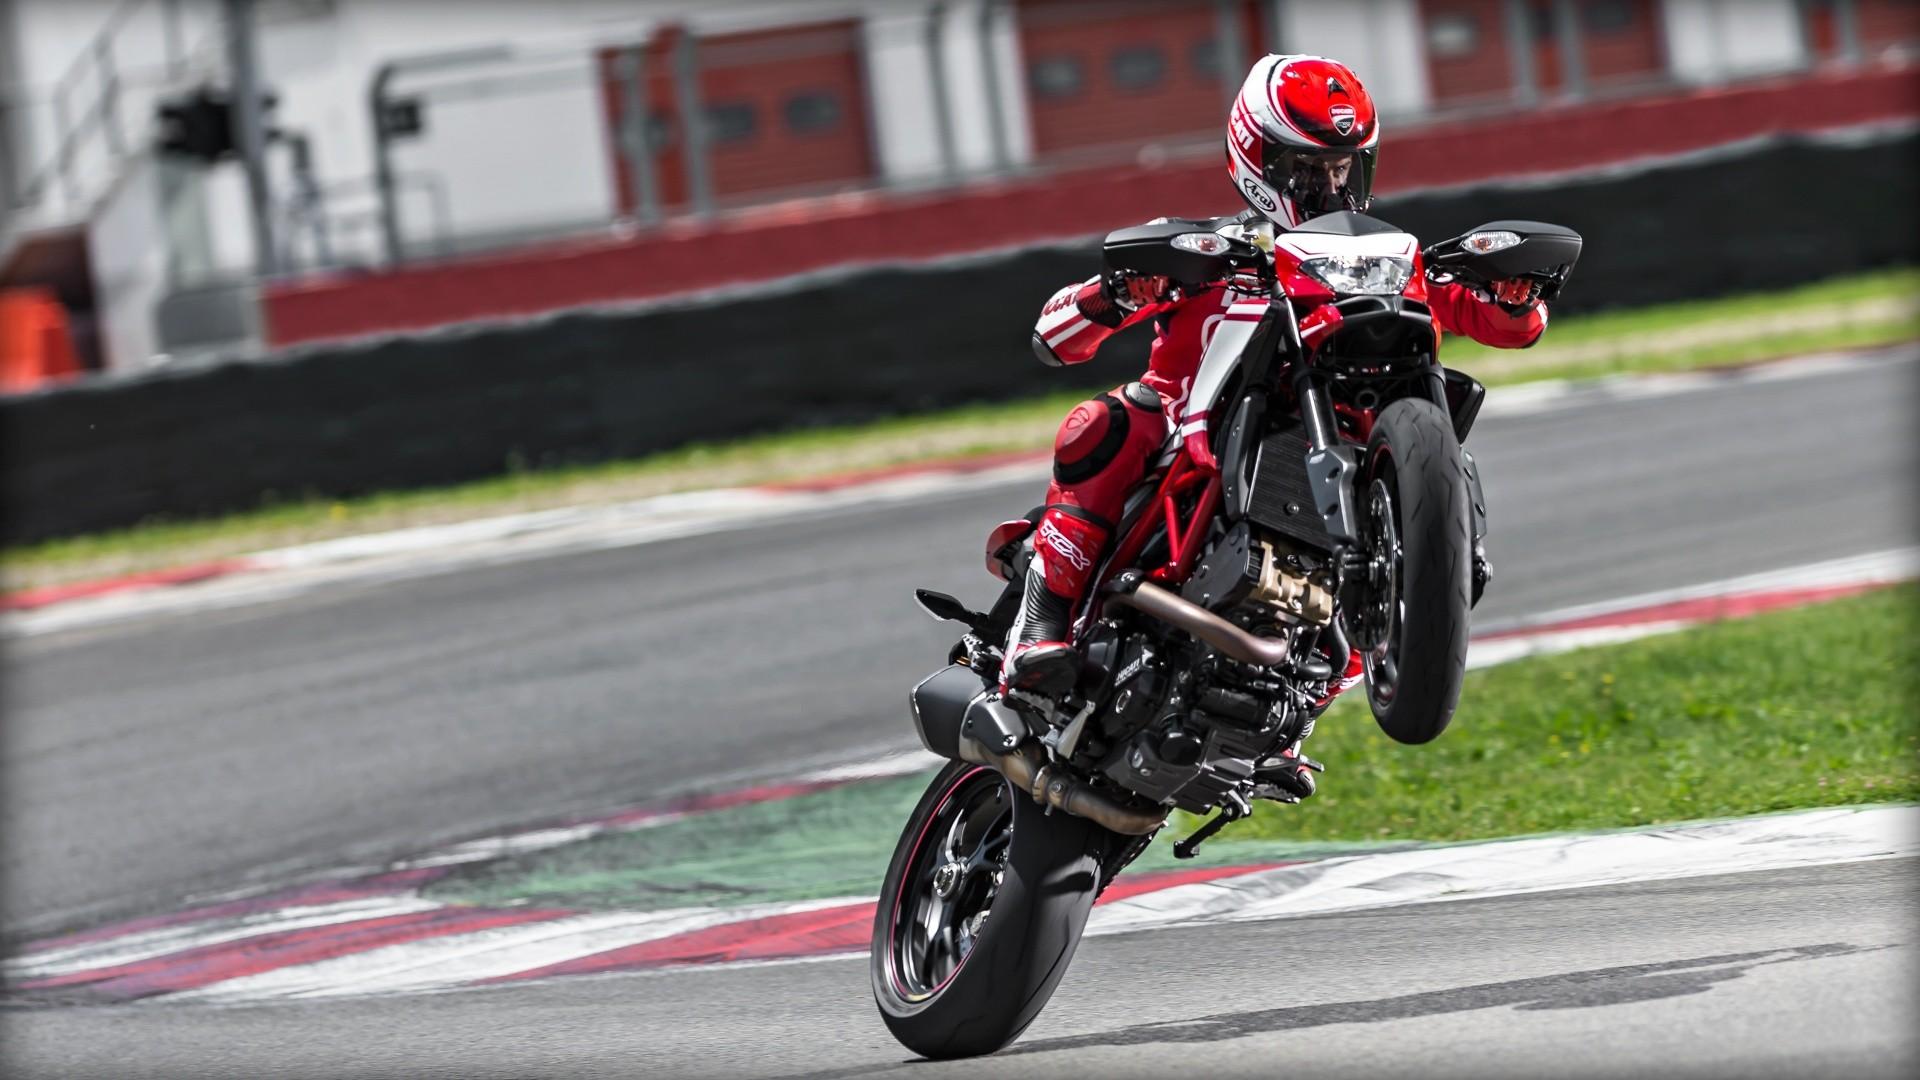 Ducati Hypermotard  Sp Video